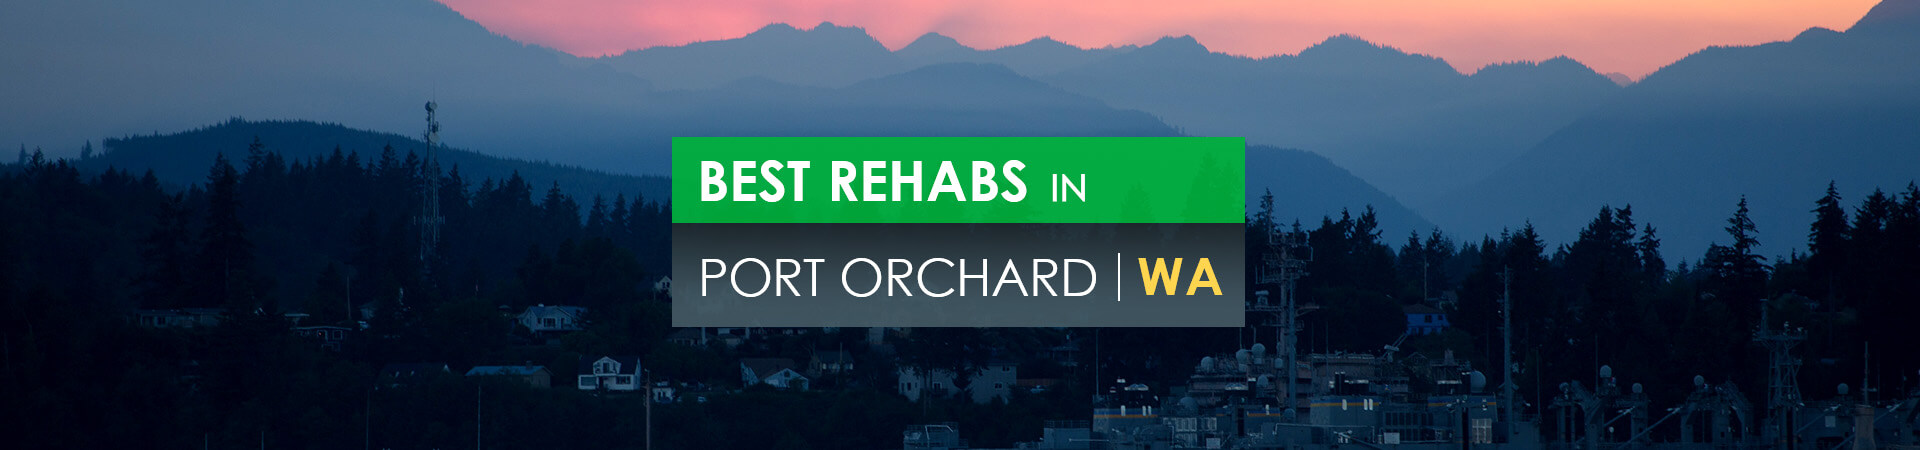 Best rehabs in Port Orchard, WA